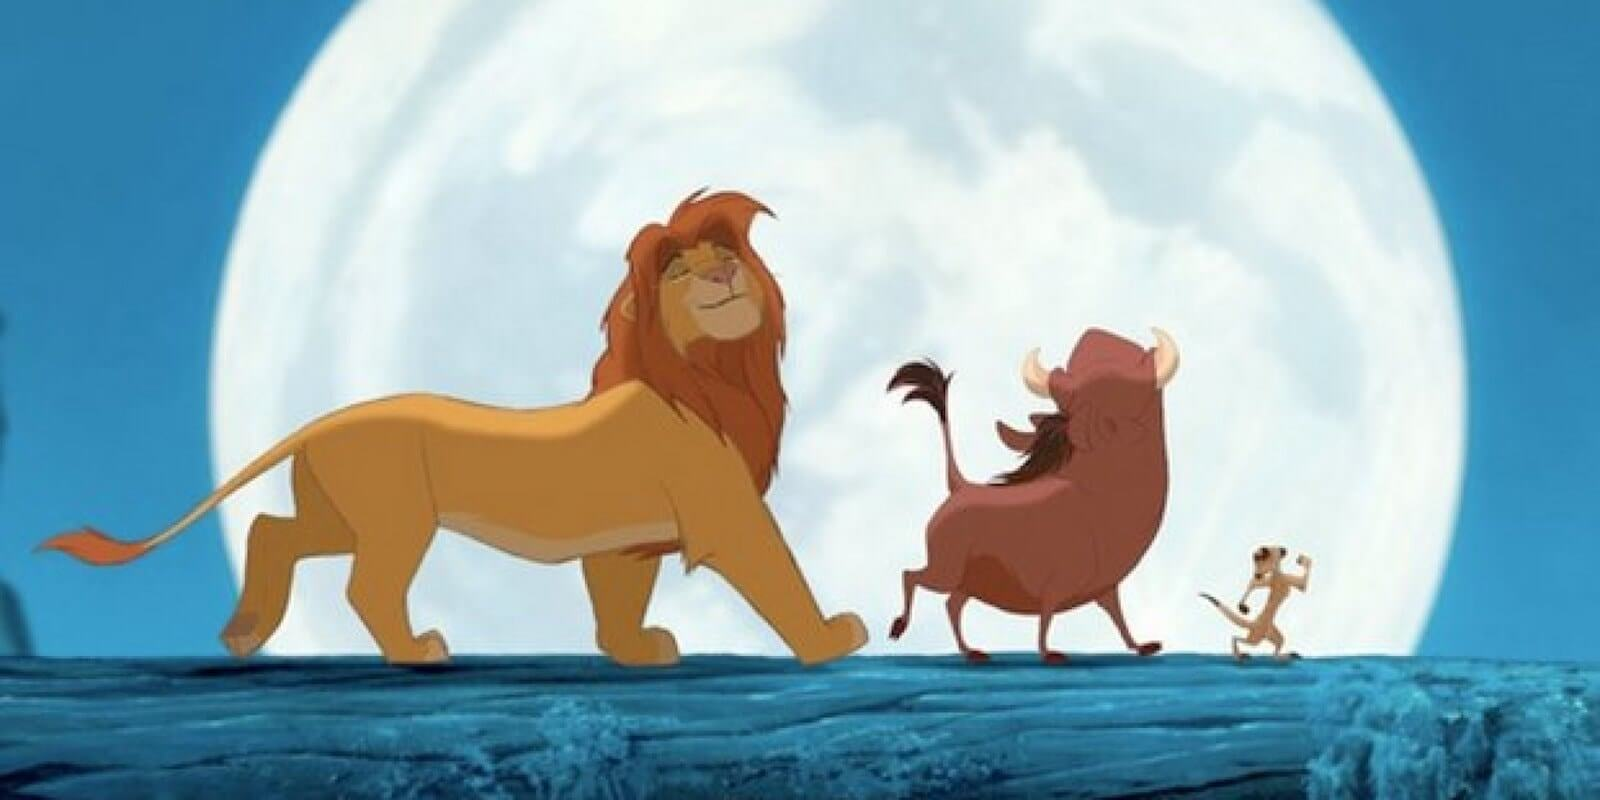 Public Domain Public Domain Books Ideas for Screenplay The Lion King